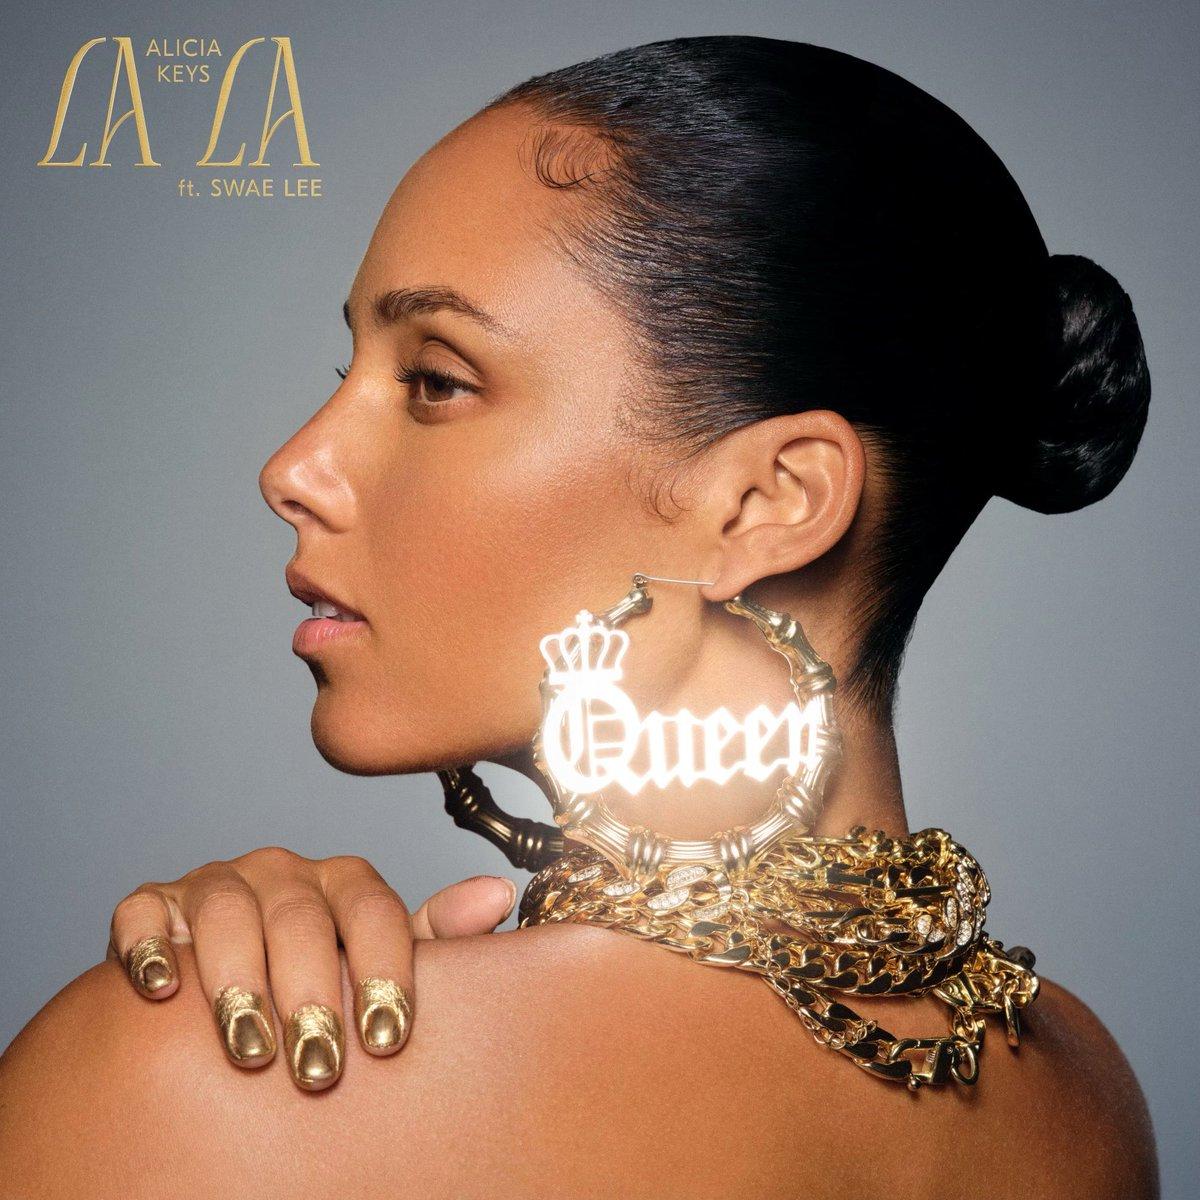 Alicia Keys releases single LALA Today!